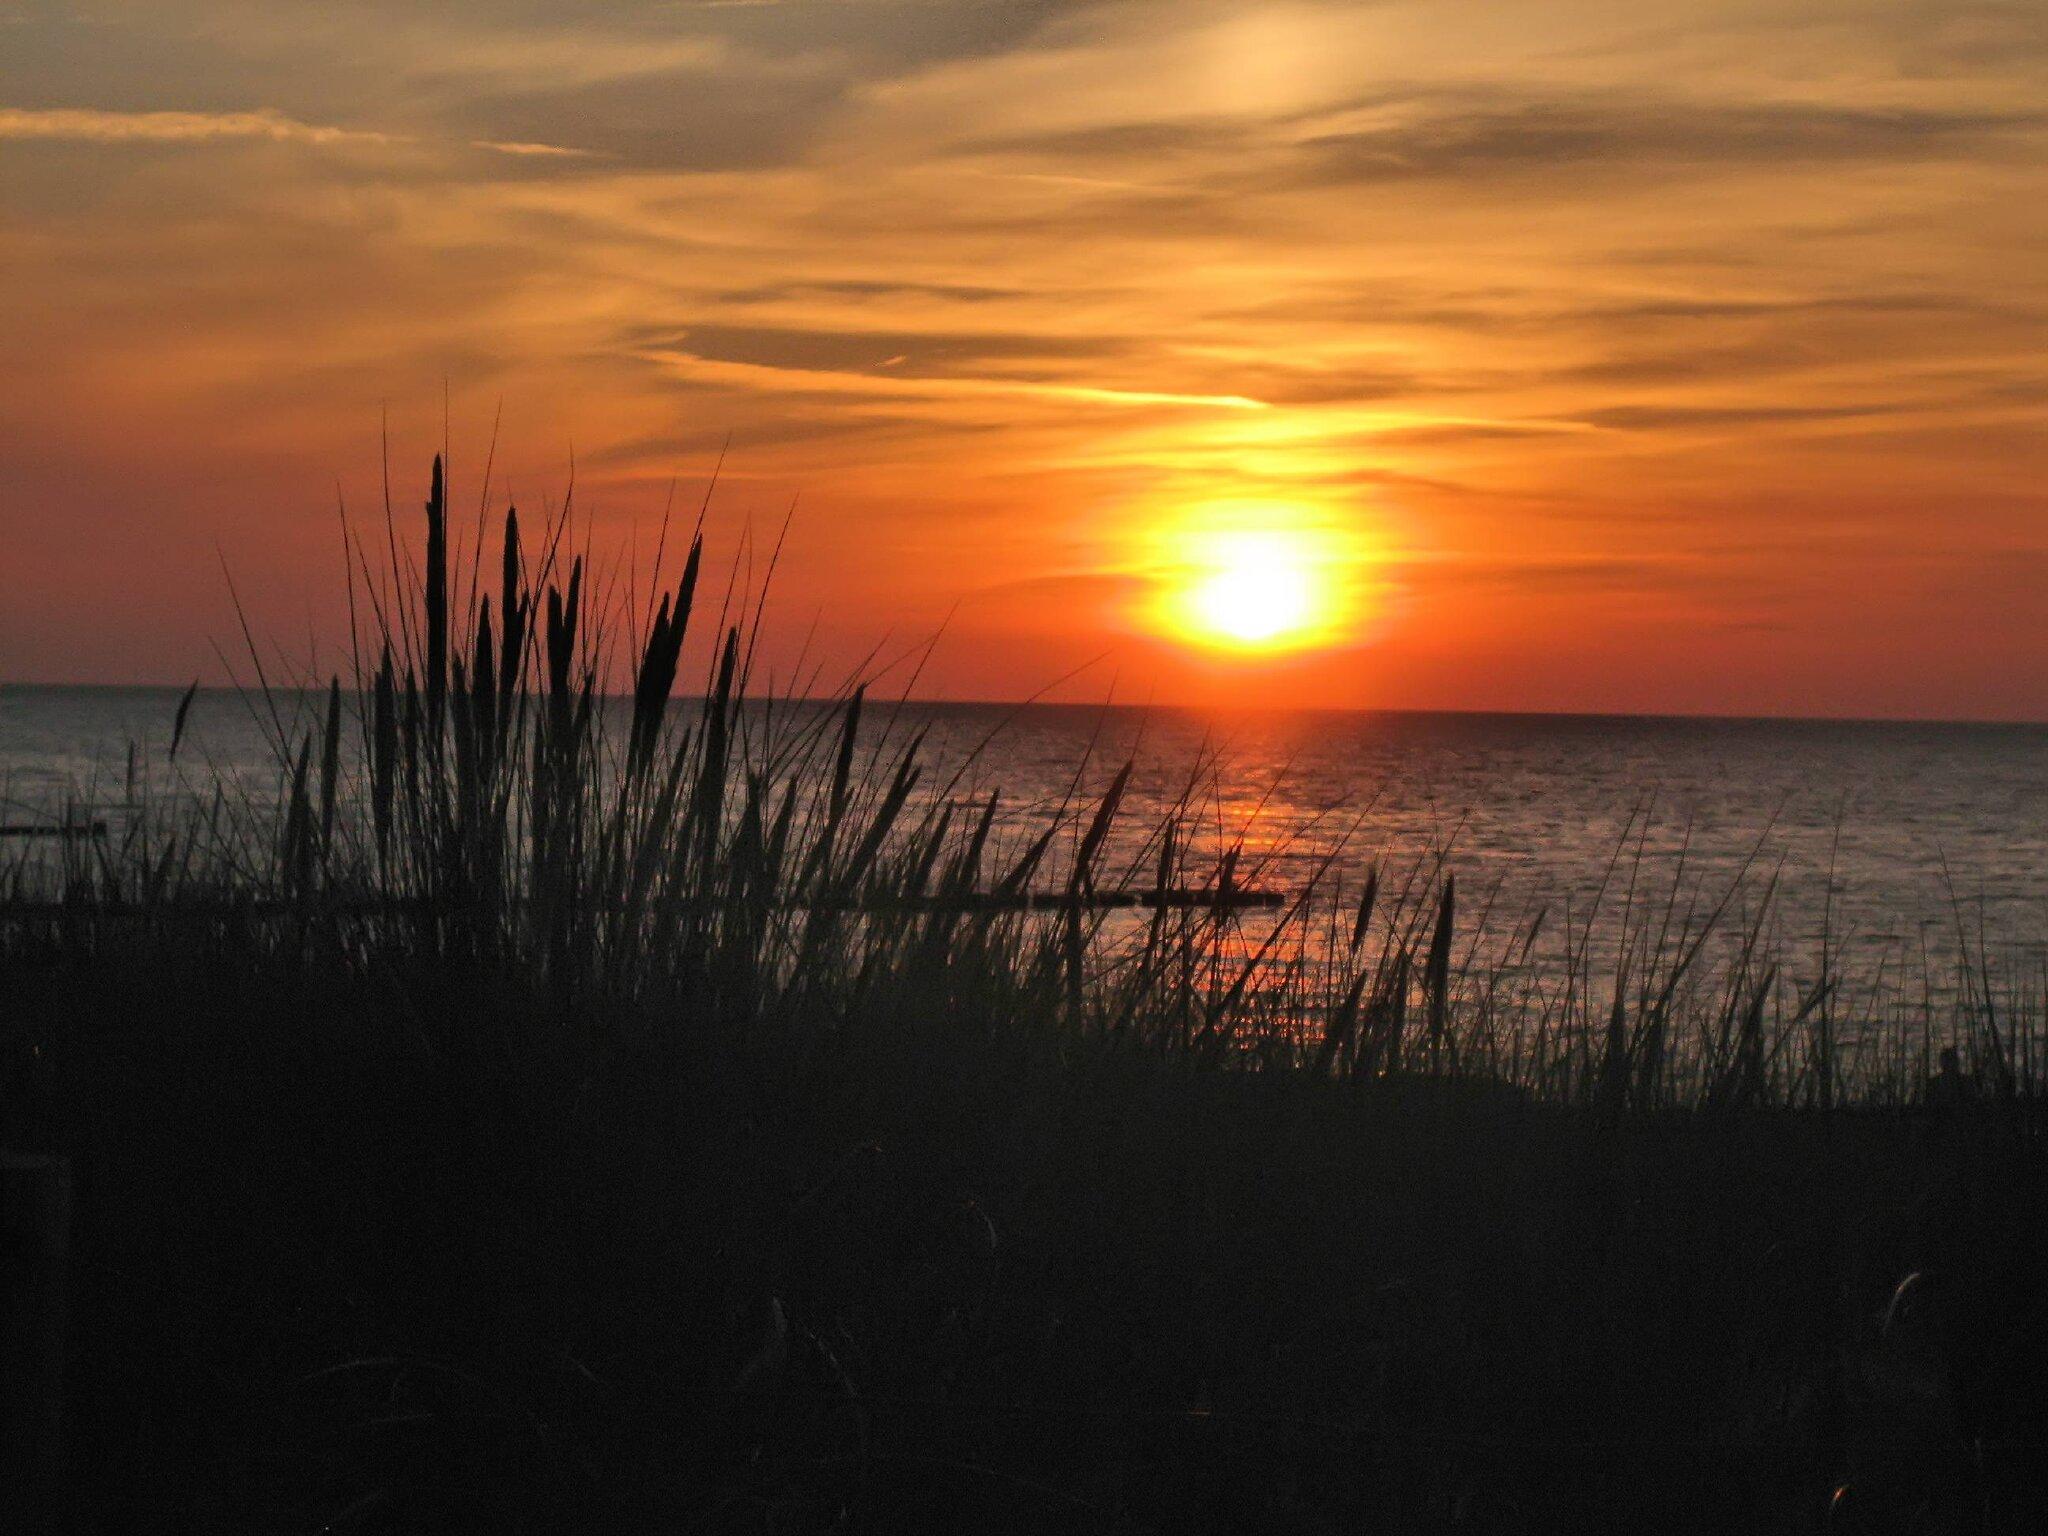 Sonnenuntergang am Zingster Strand